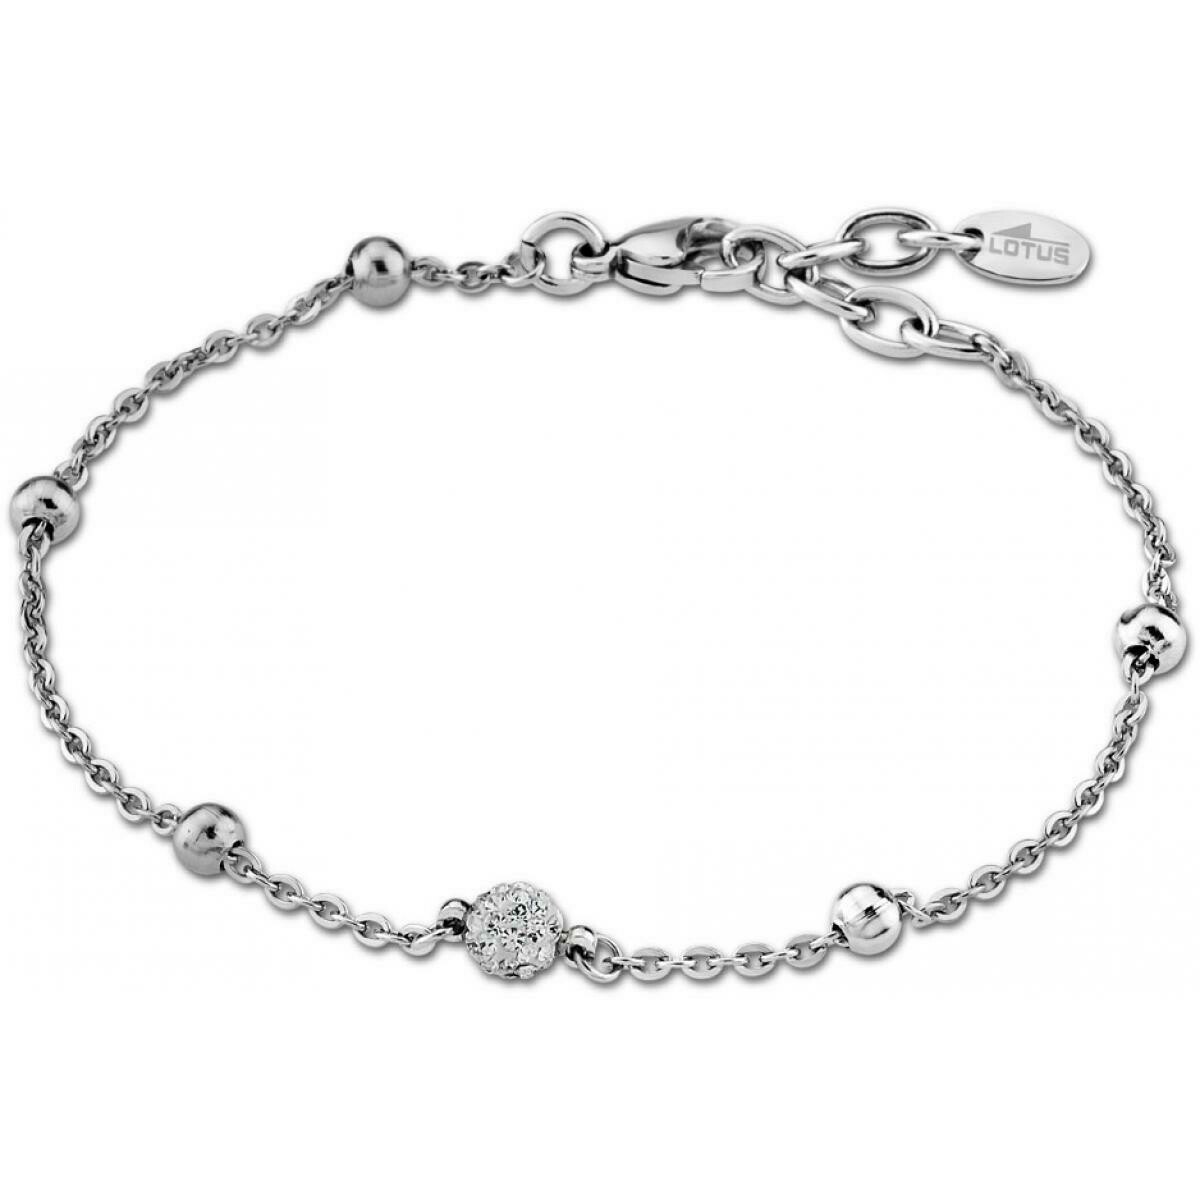 Bracelet Lotus LS1763/2/1